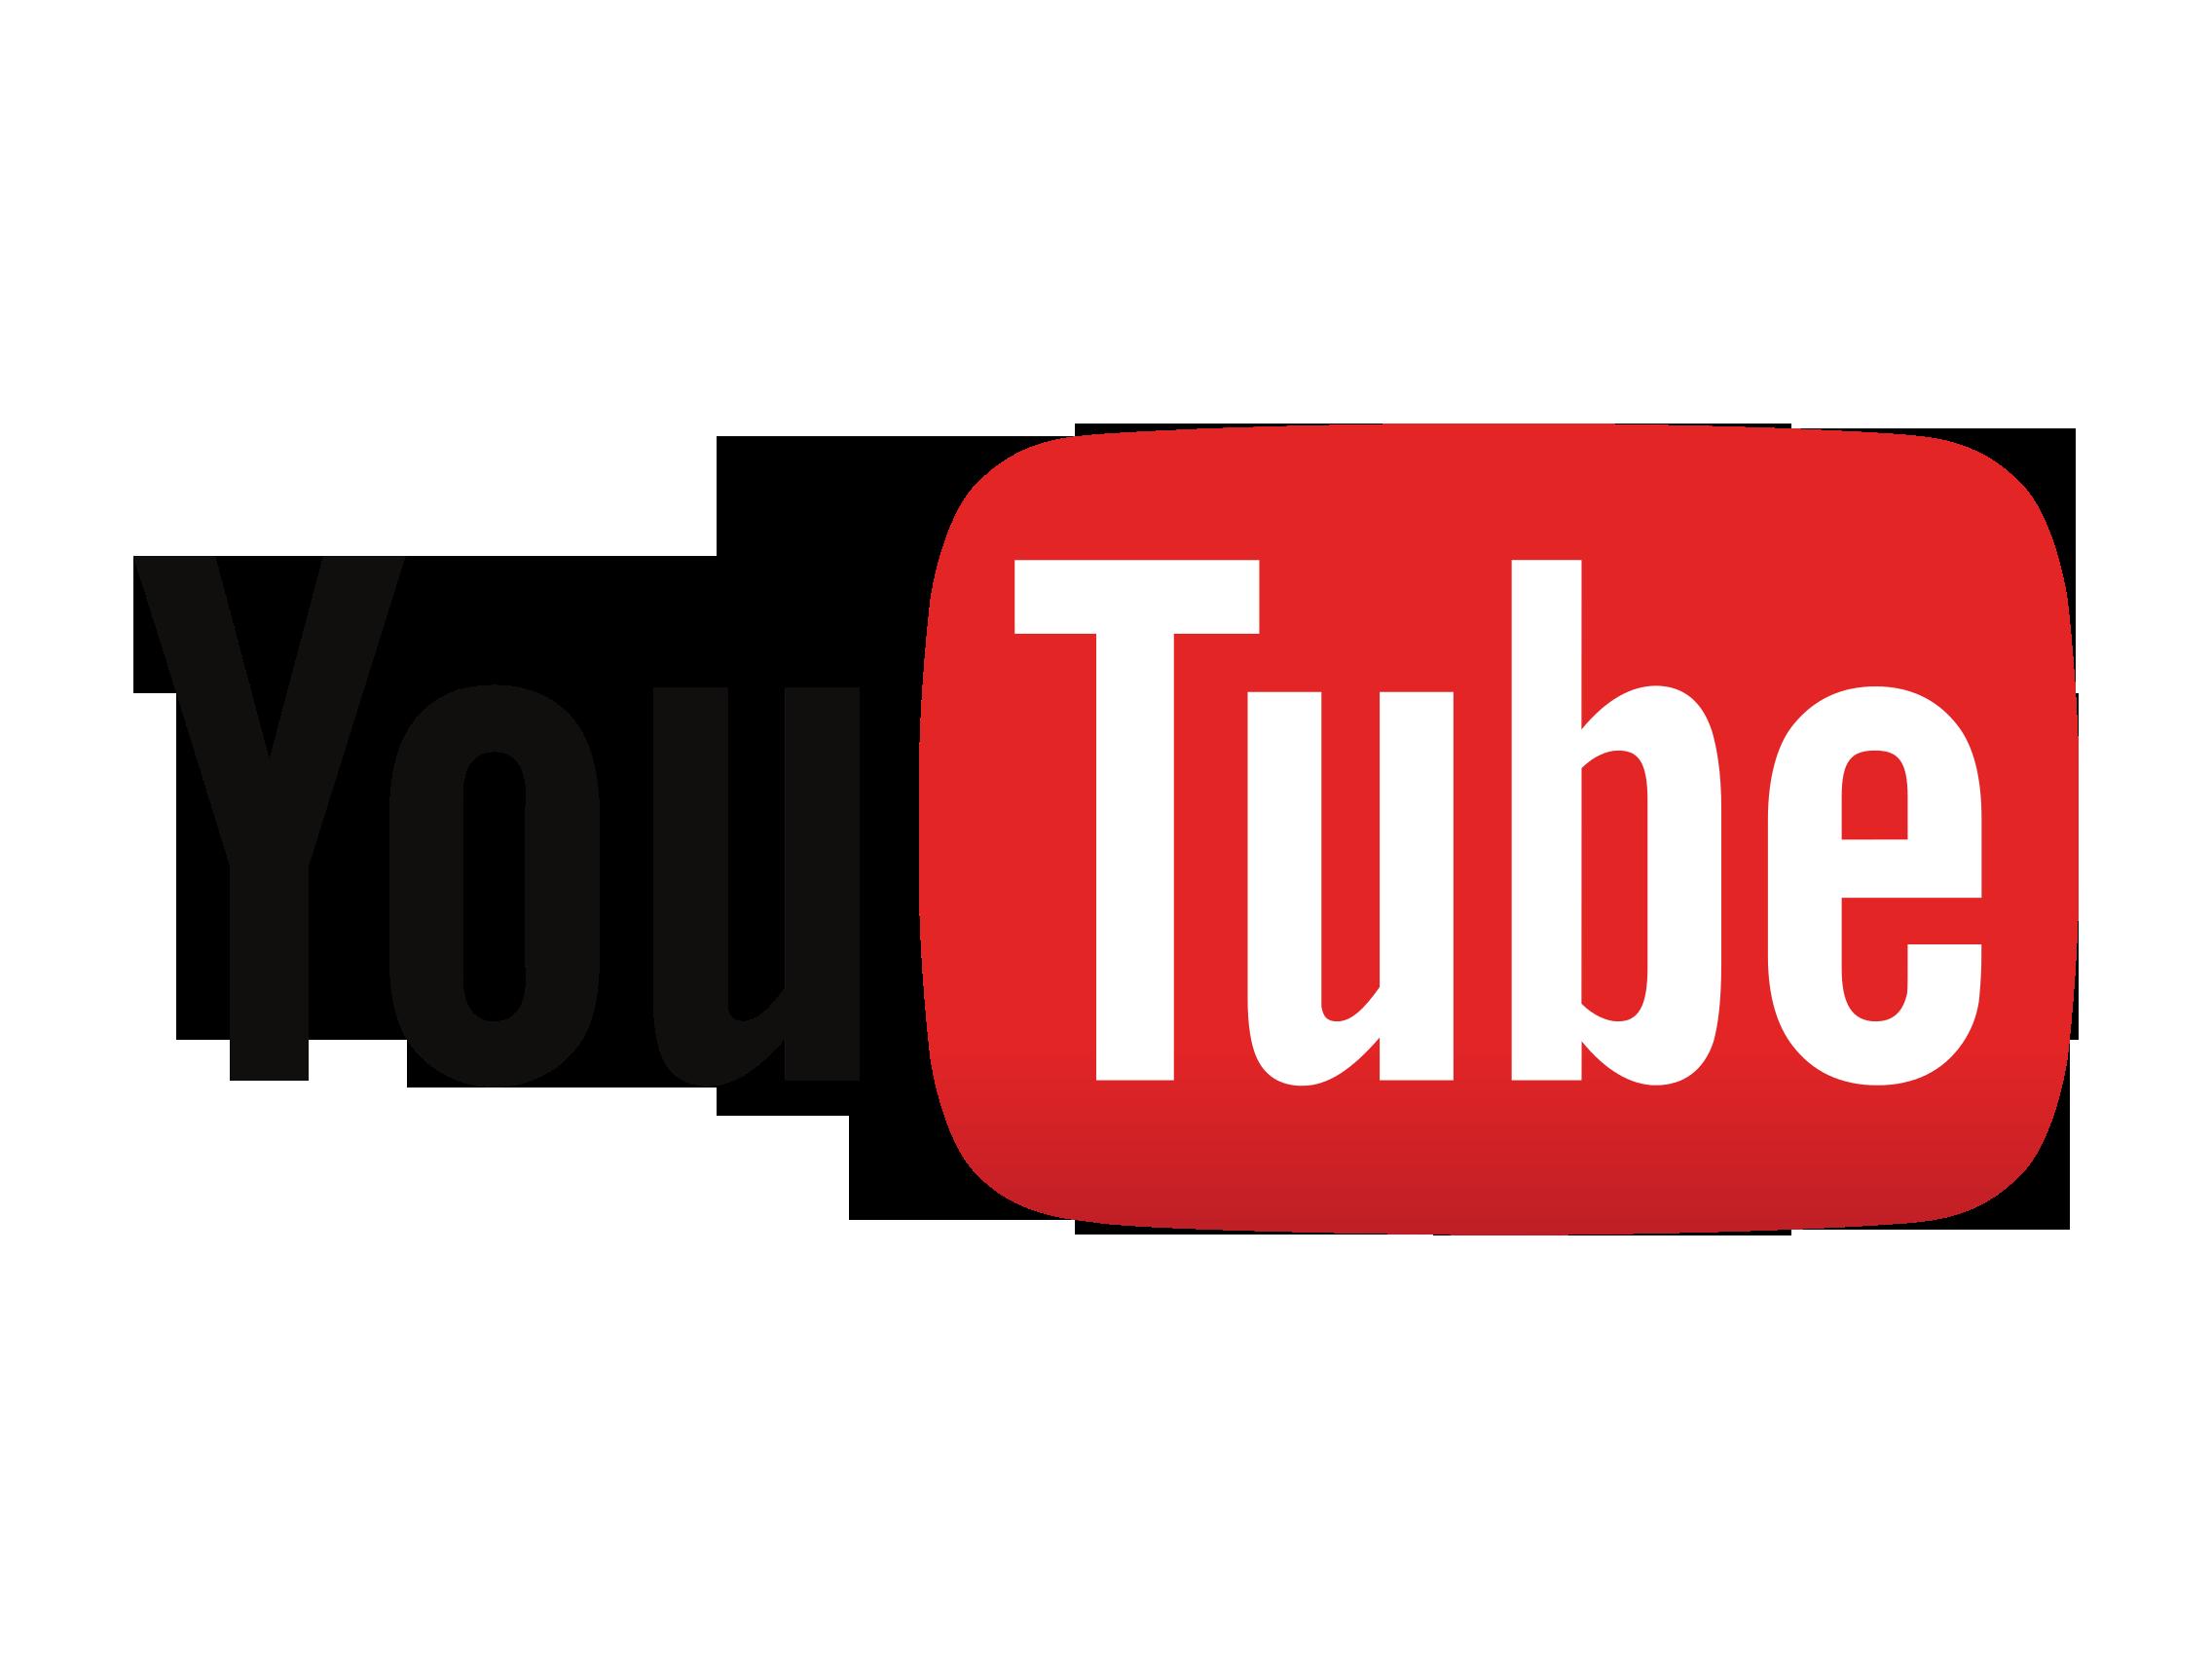 логотип для ютуба картинки это